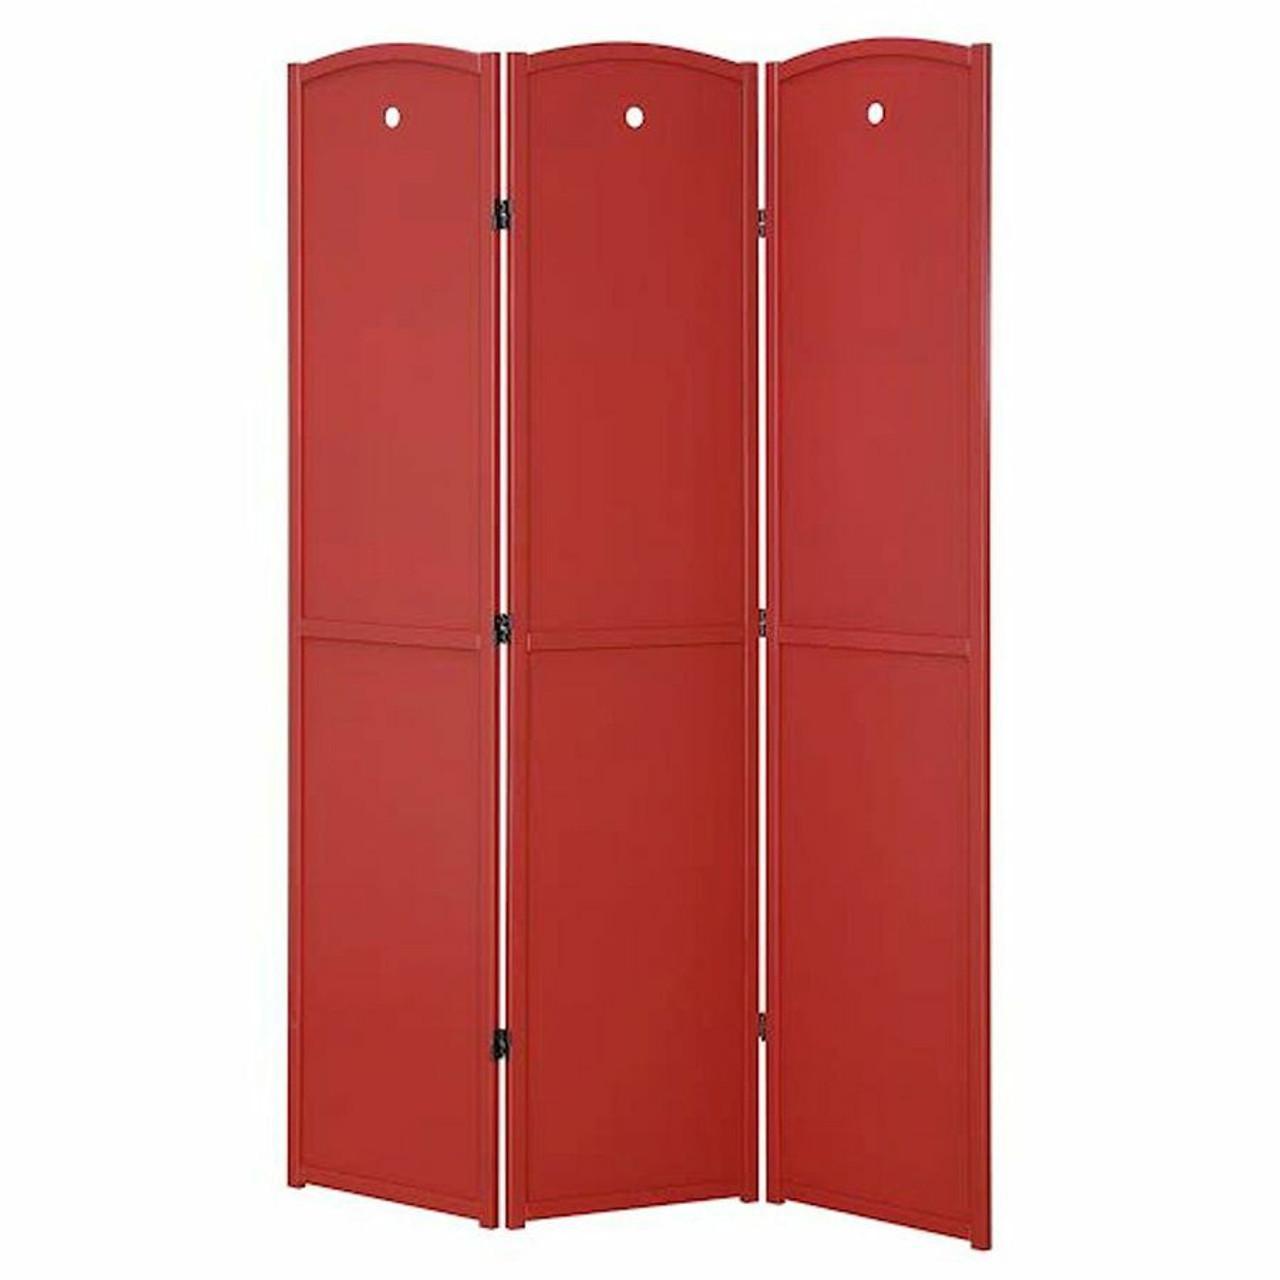 Room Divider 3 Panel Solid Wood Blue, Green, Honey, or Red Color